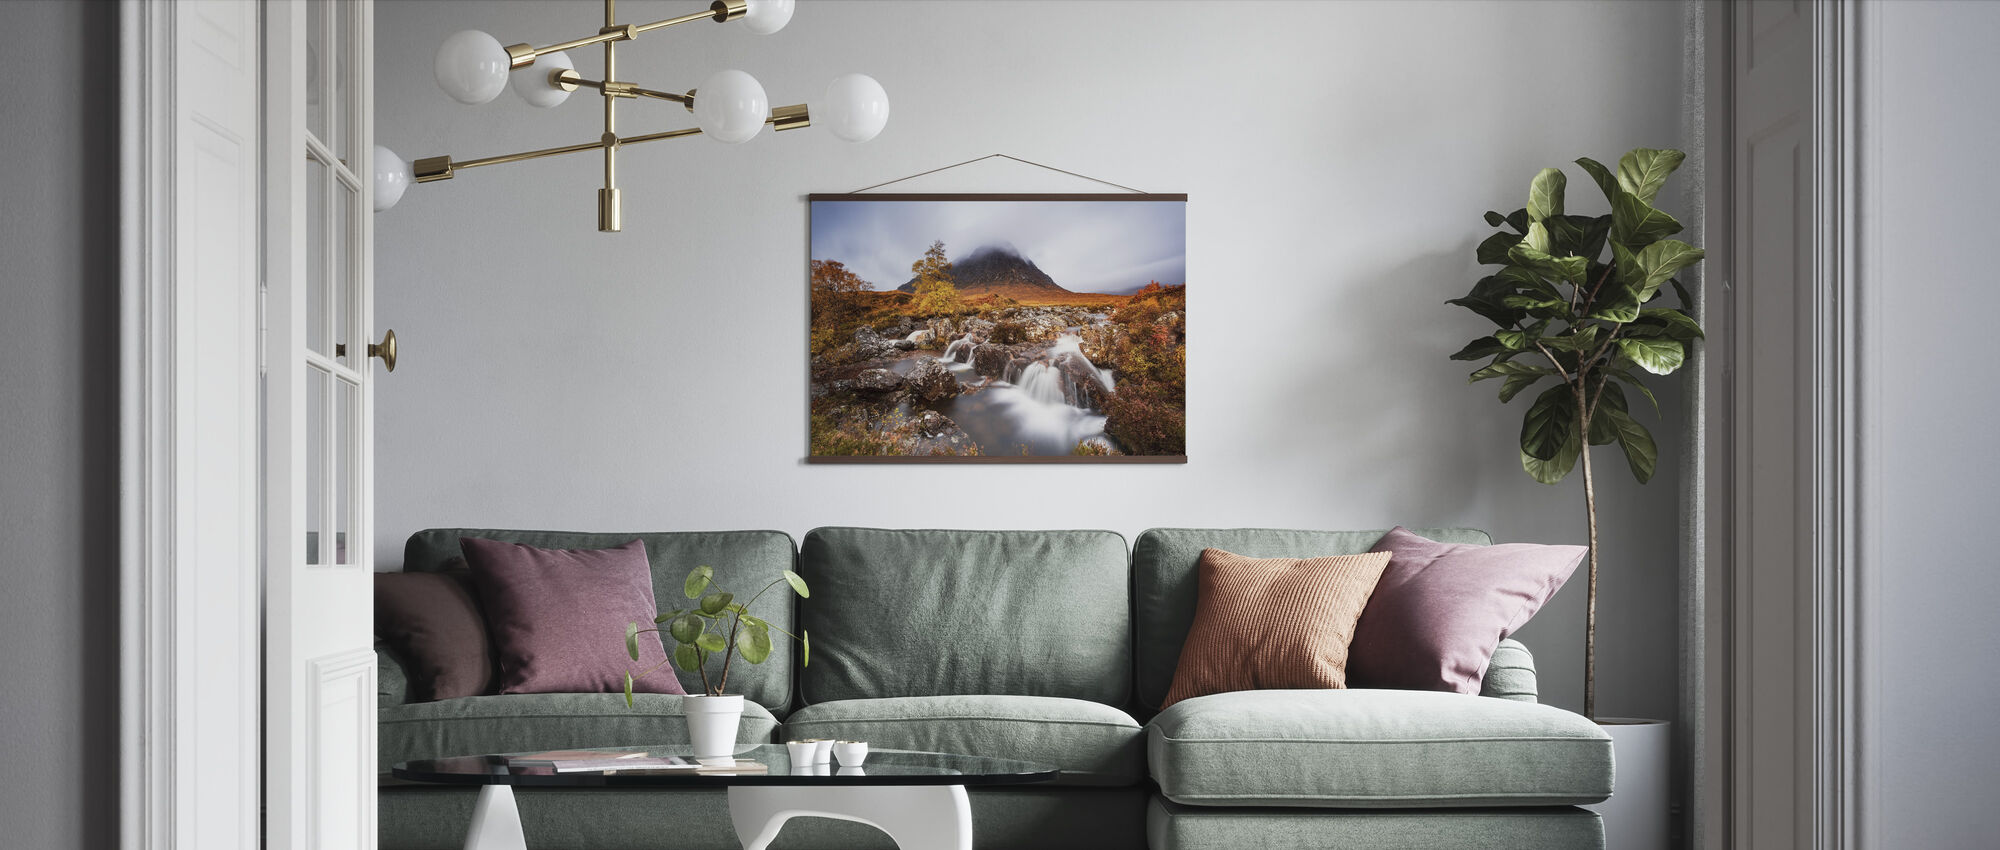 Autumn in the Glencoe - Poster - Living Room